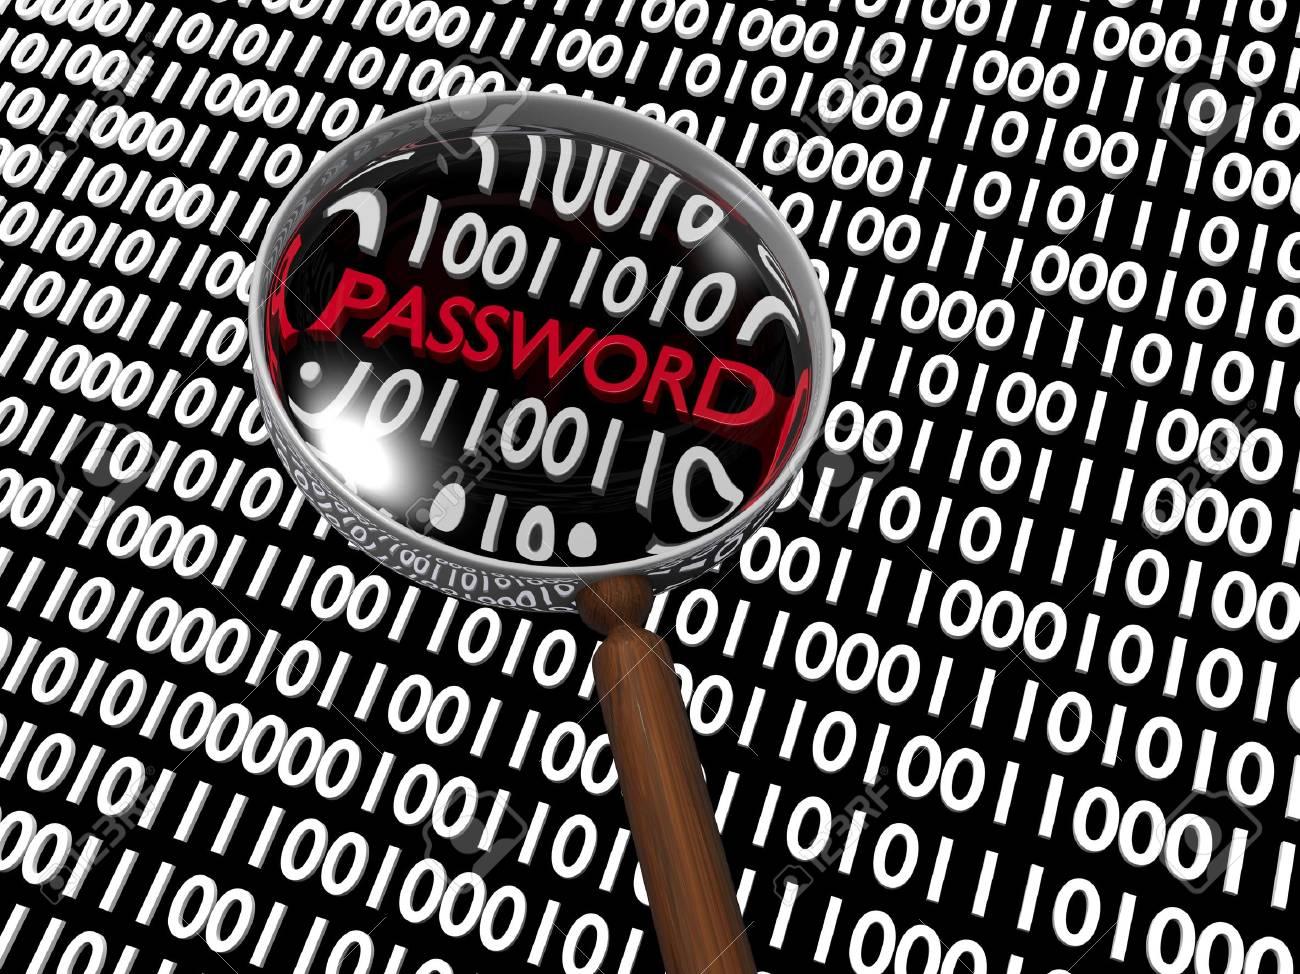 Hidden Numeric Password in Plenty of Binary Digits Stock Photo - 16488125